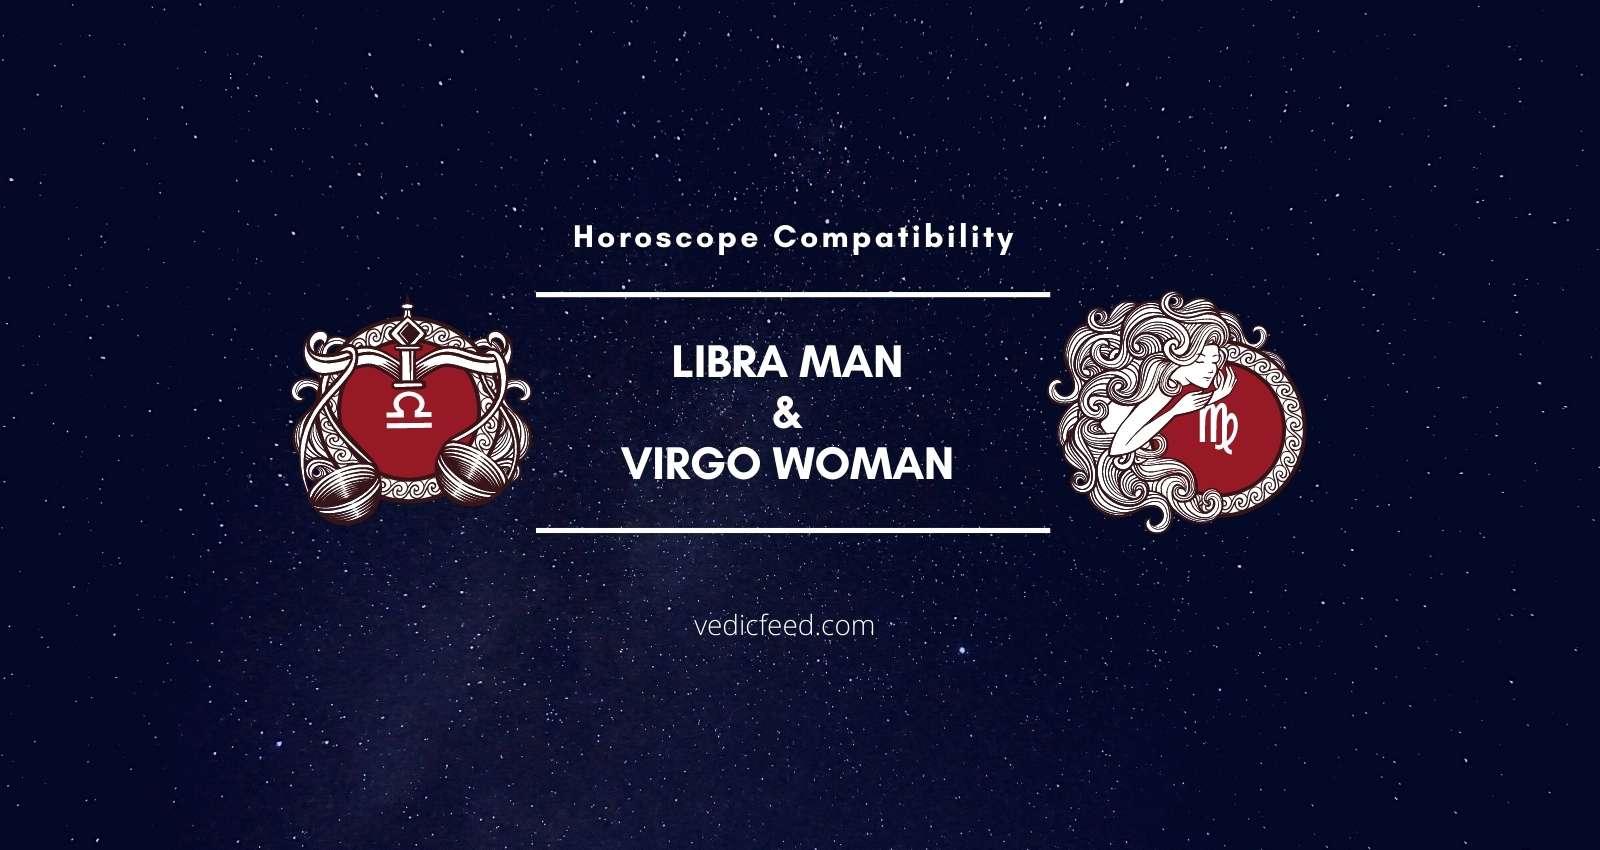 Libra Man and Virgo Woman Compatibility